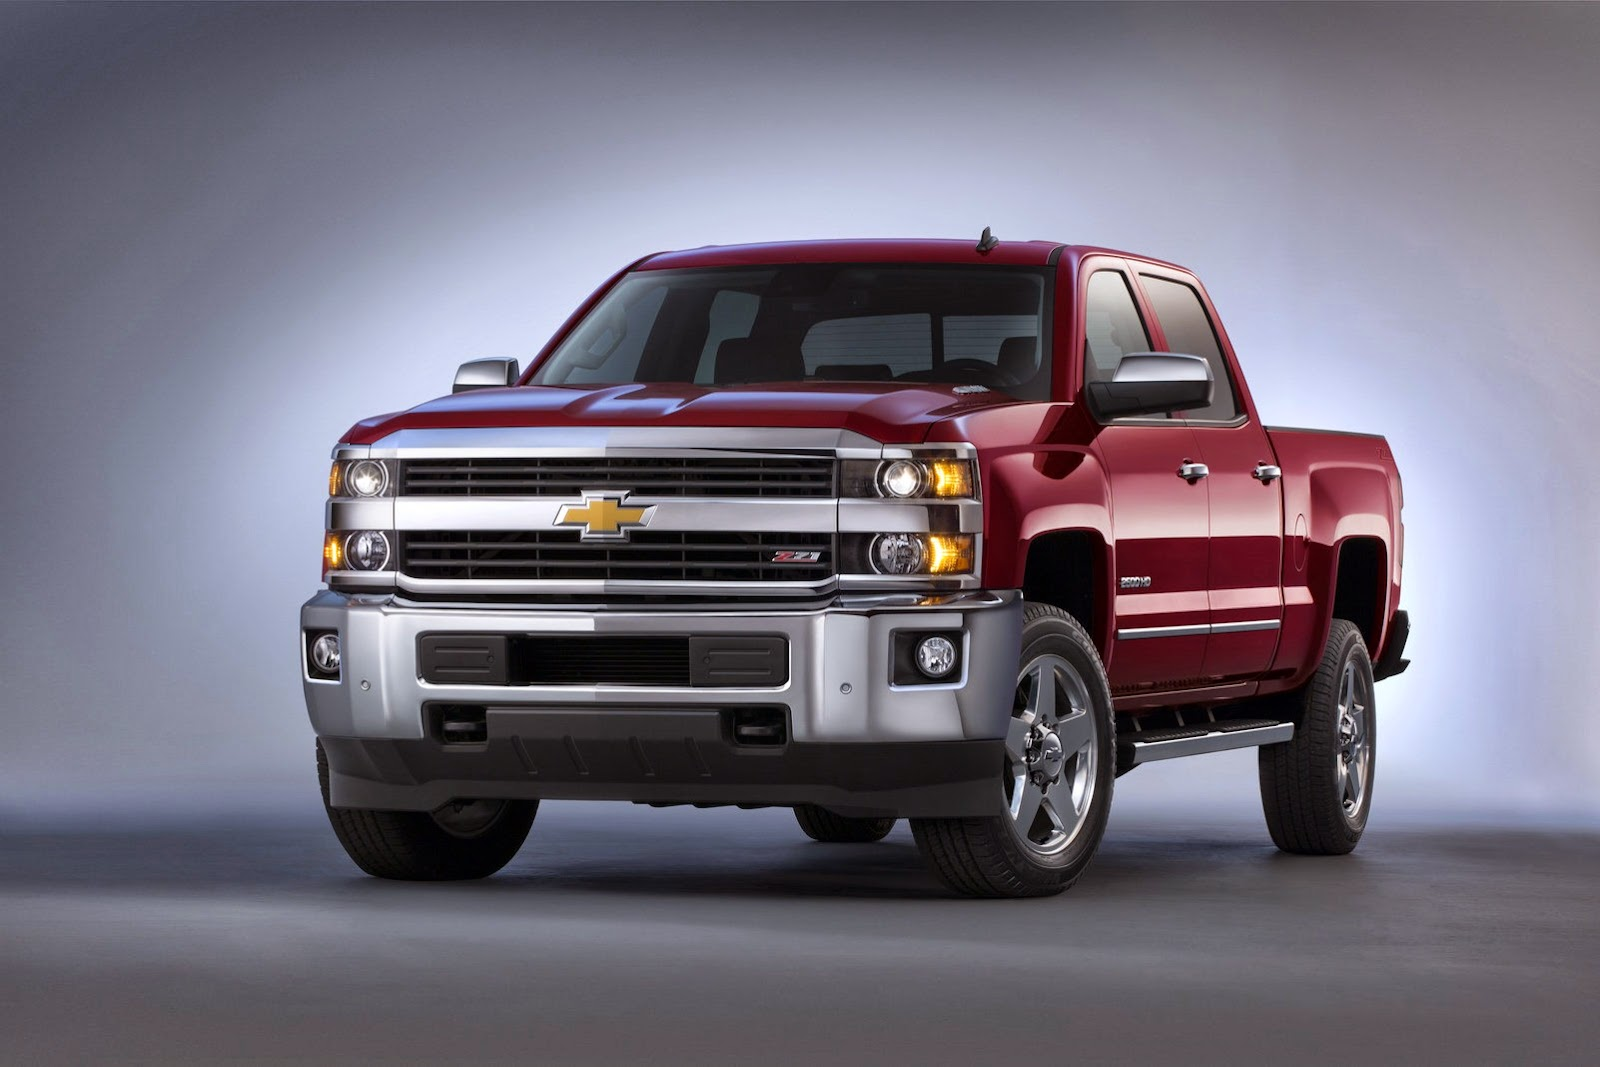 2015-Chevrolet-Silverado-3500-HD-18%25255B2%25255D.jpg